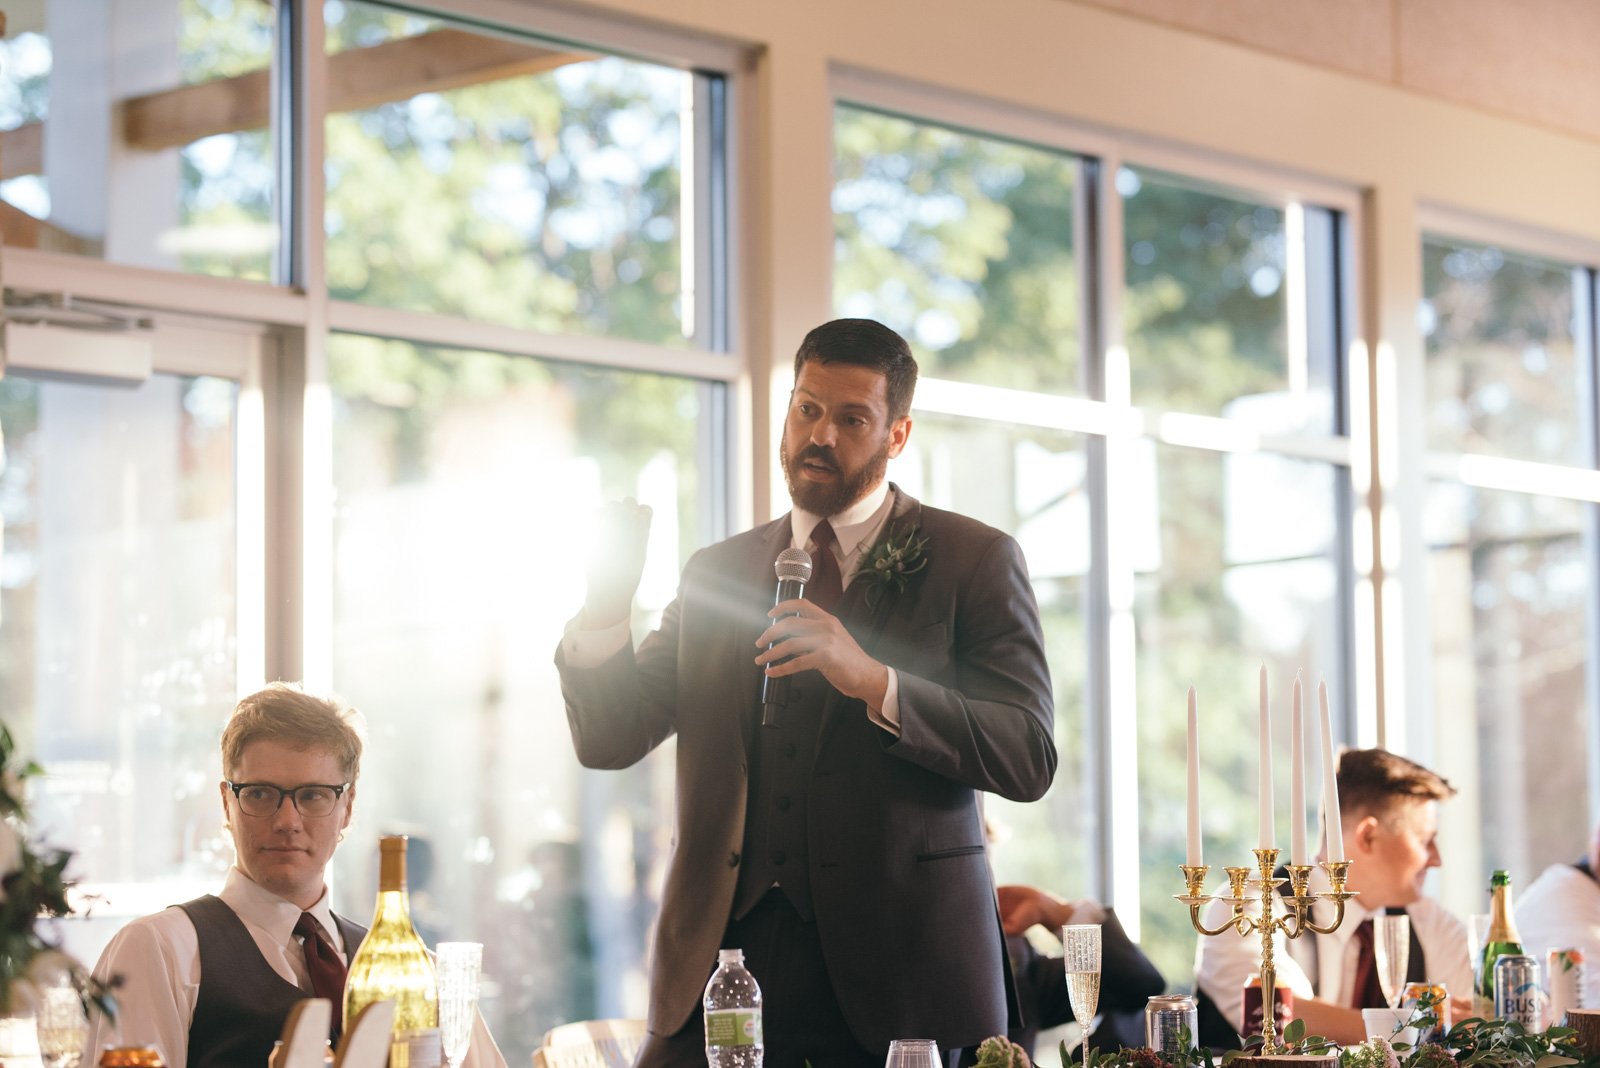 wedding reception speeches Ushers Ferry Historic Village wedding venue